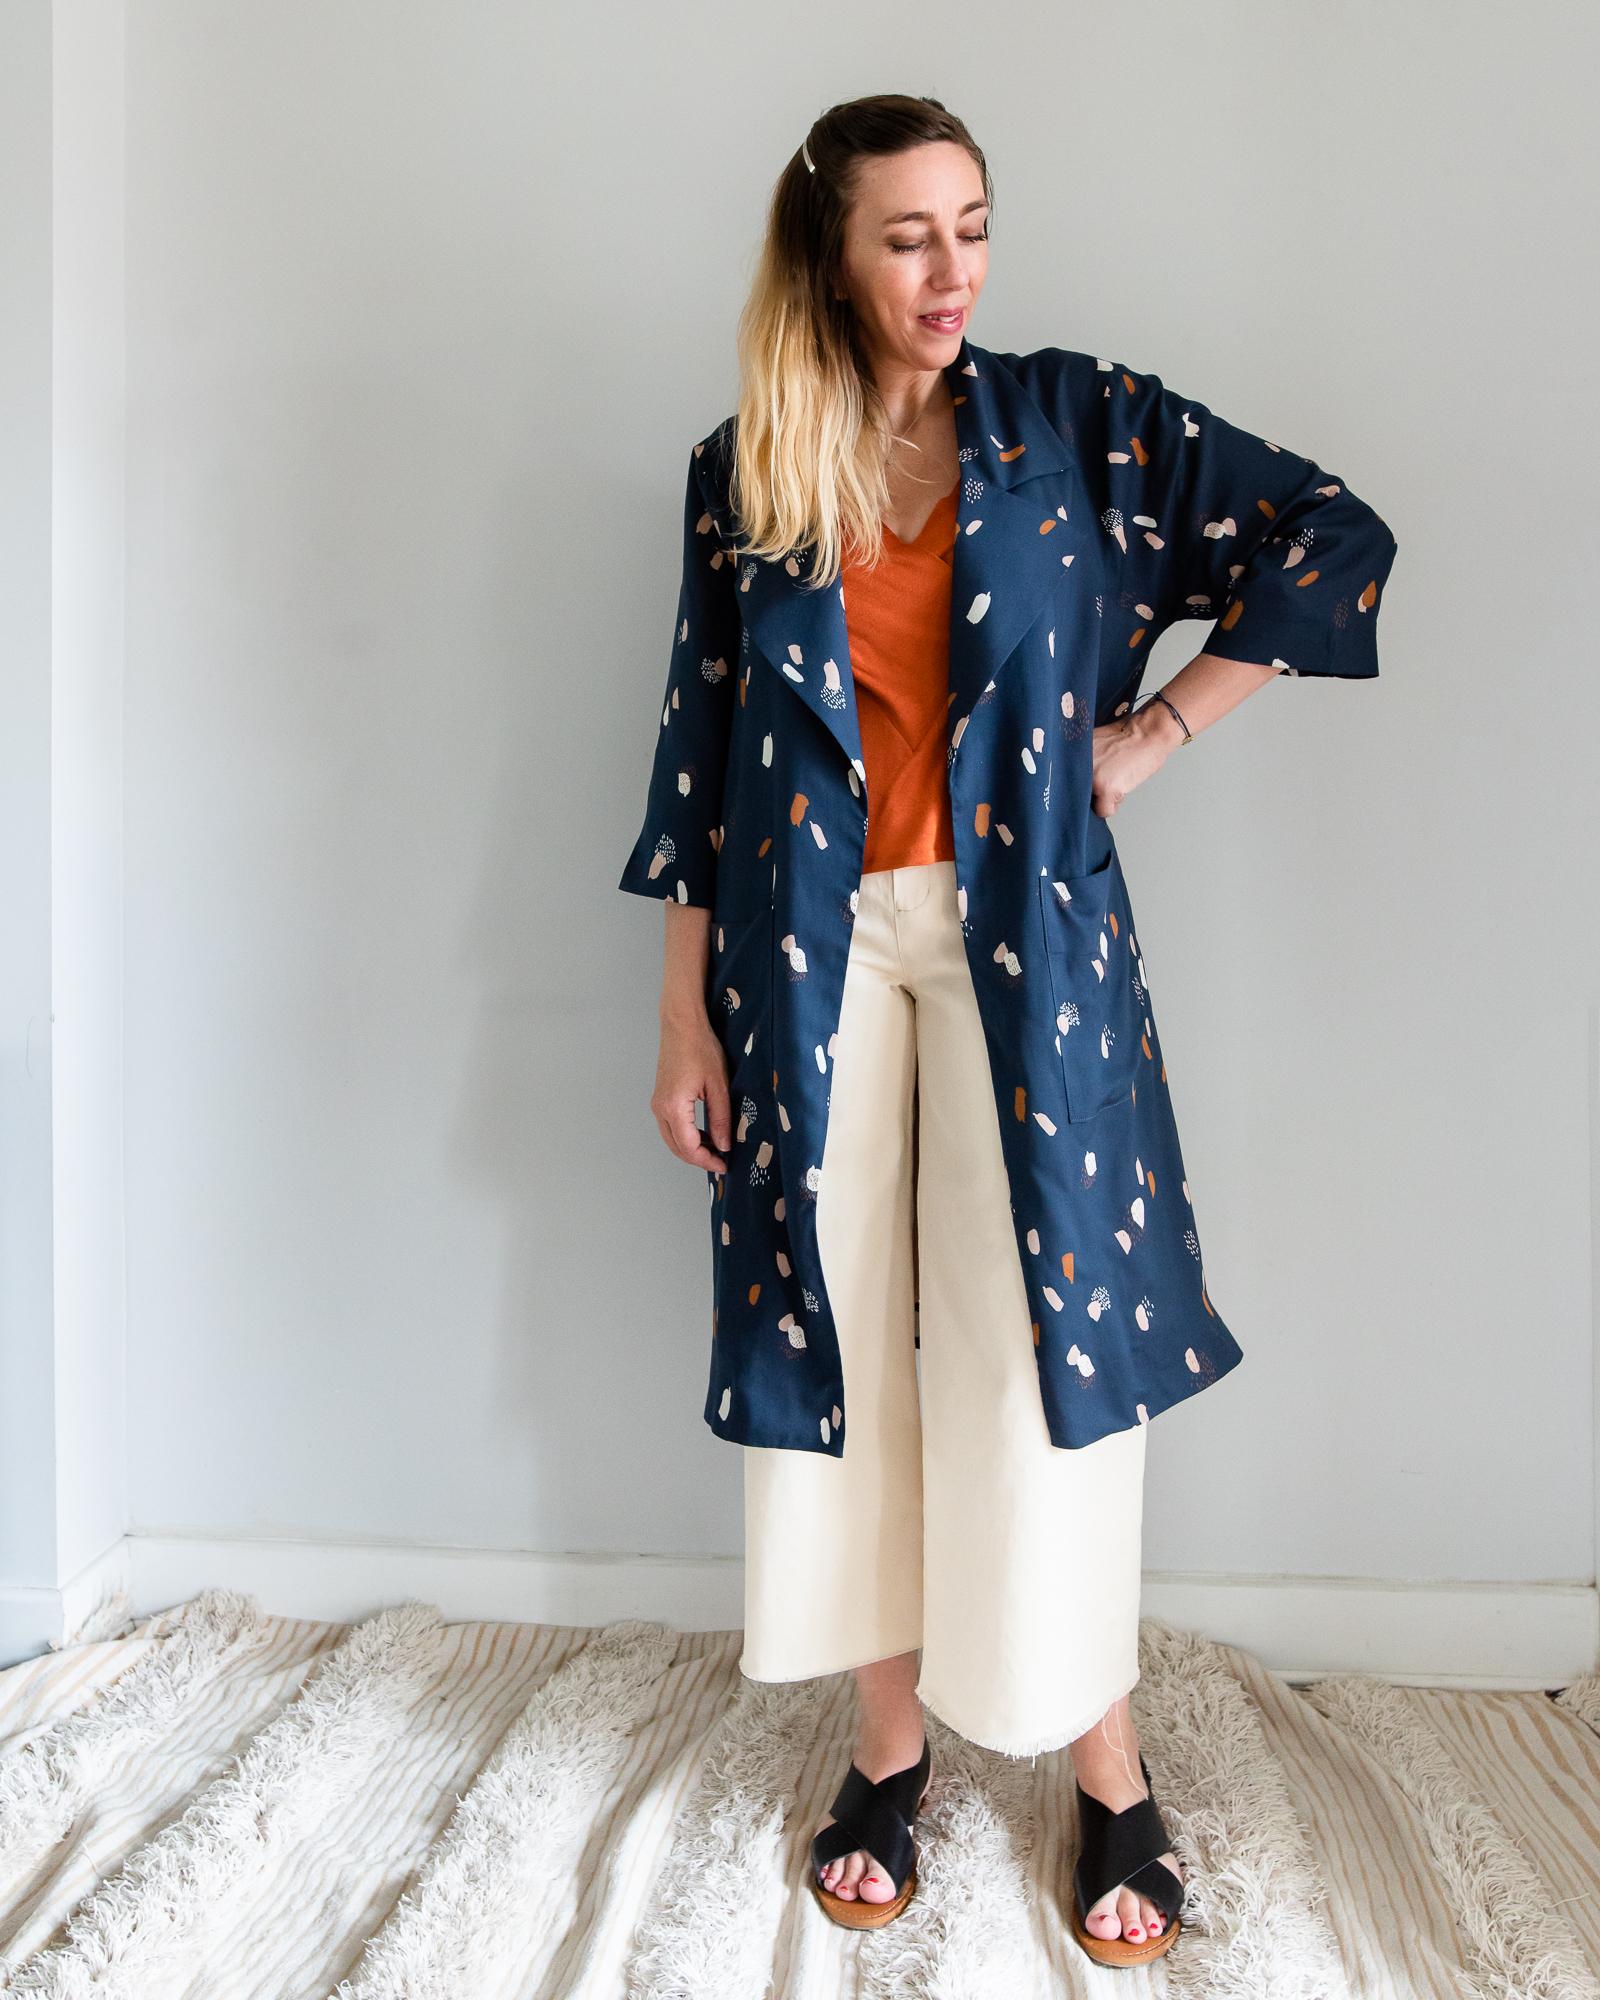 Atelier Brunette Surtout Coat04.jpg